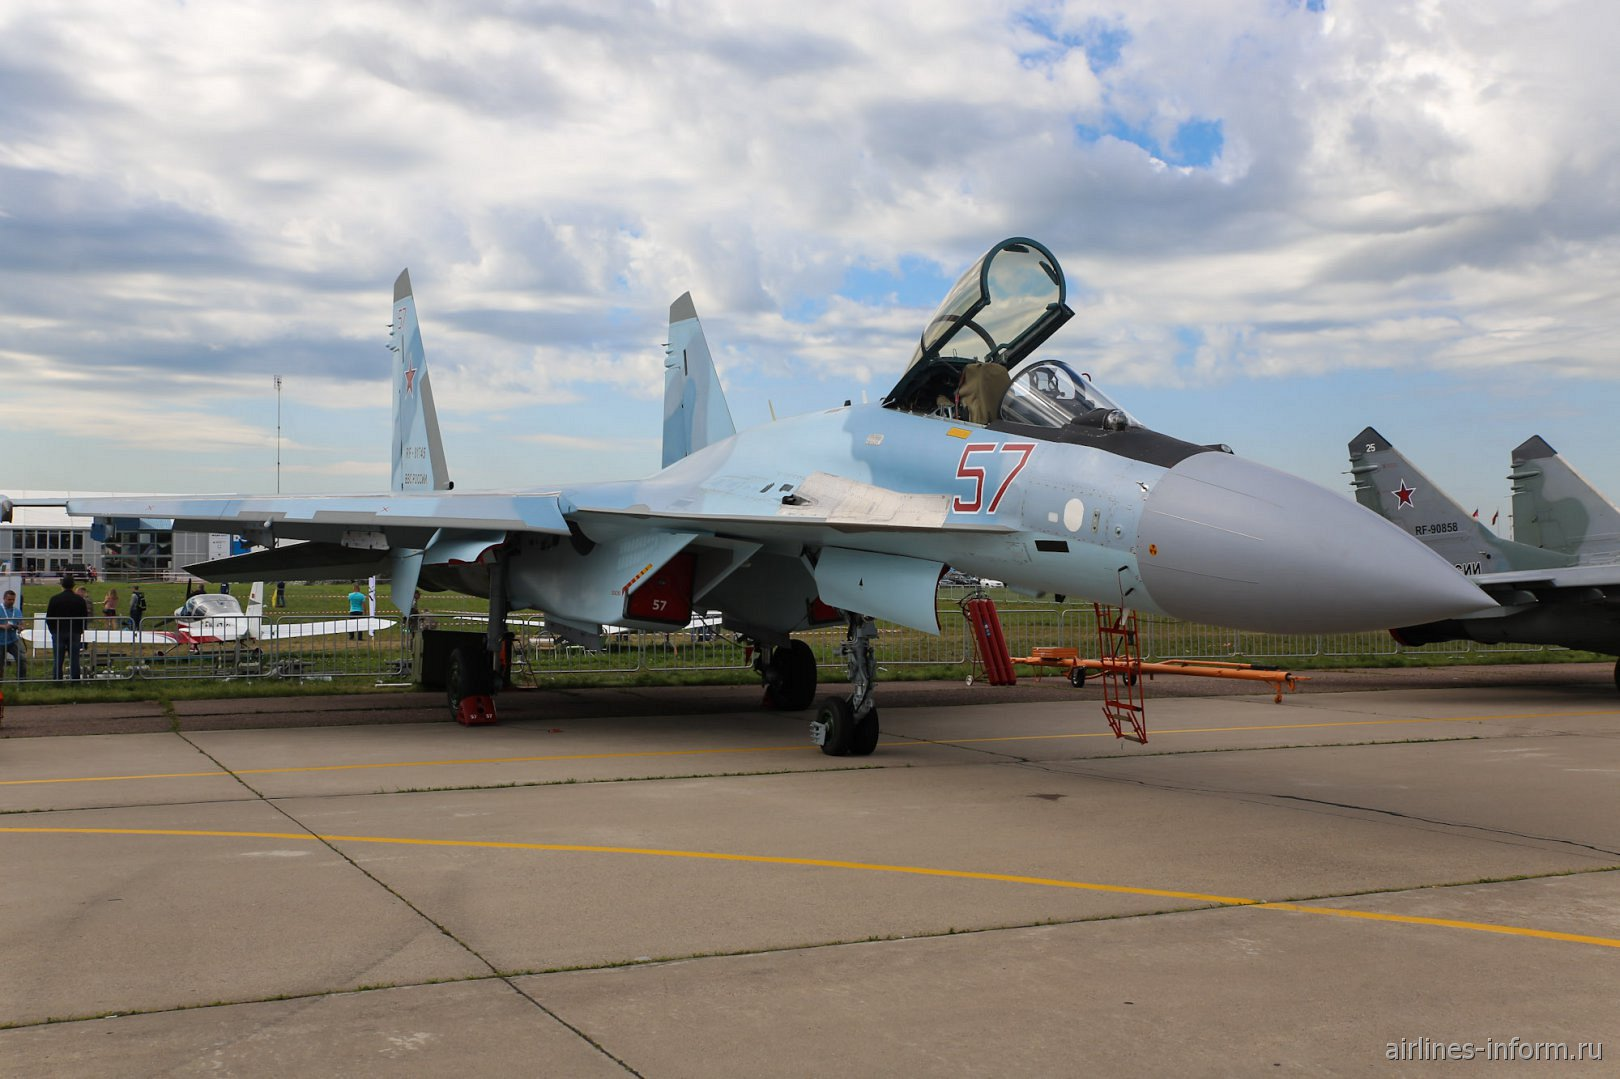 Истребитель Су-35 на авиасалоне МАКС-2017